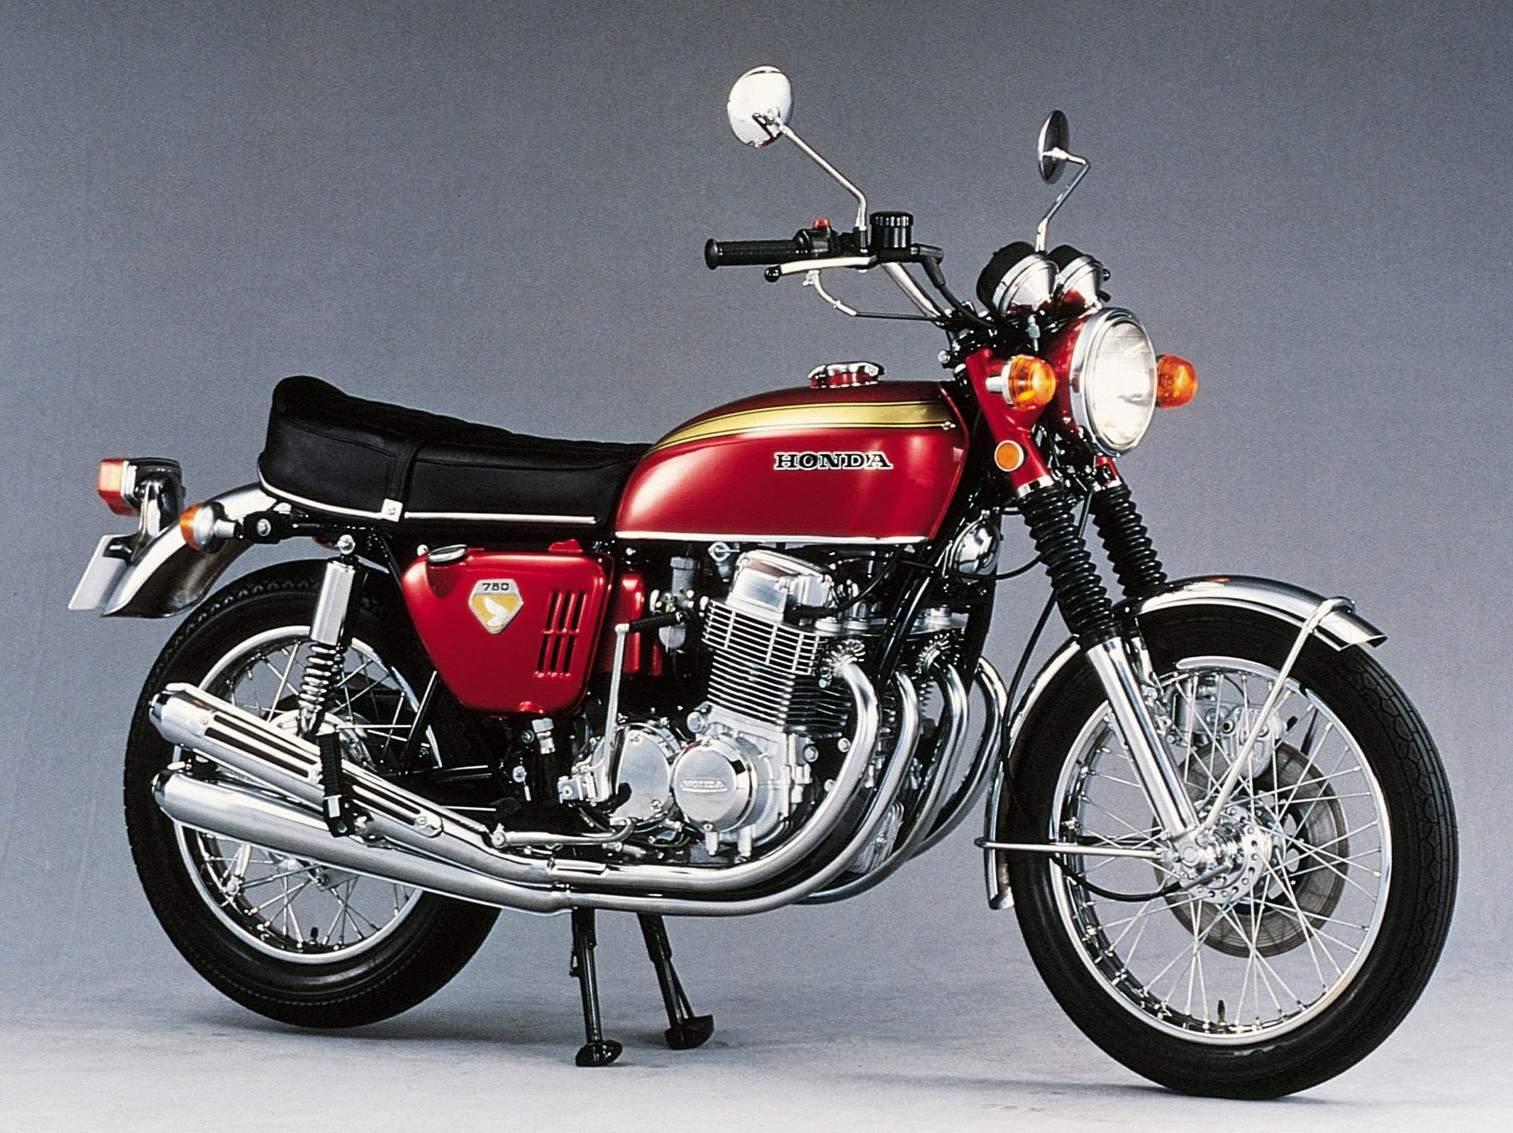 A studio shot of the 1069 Honda CB750 motorcycle